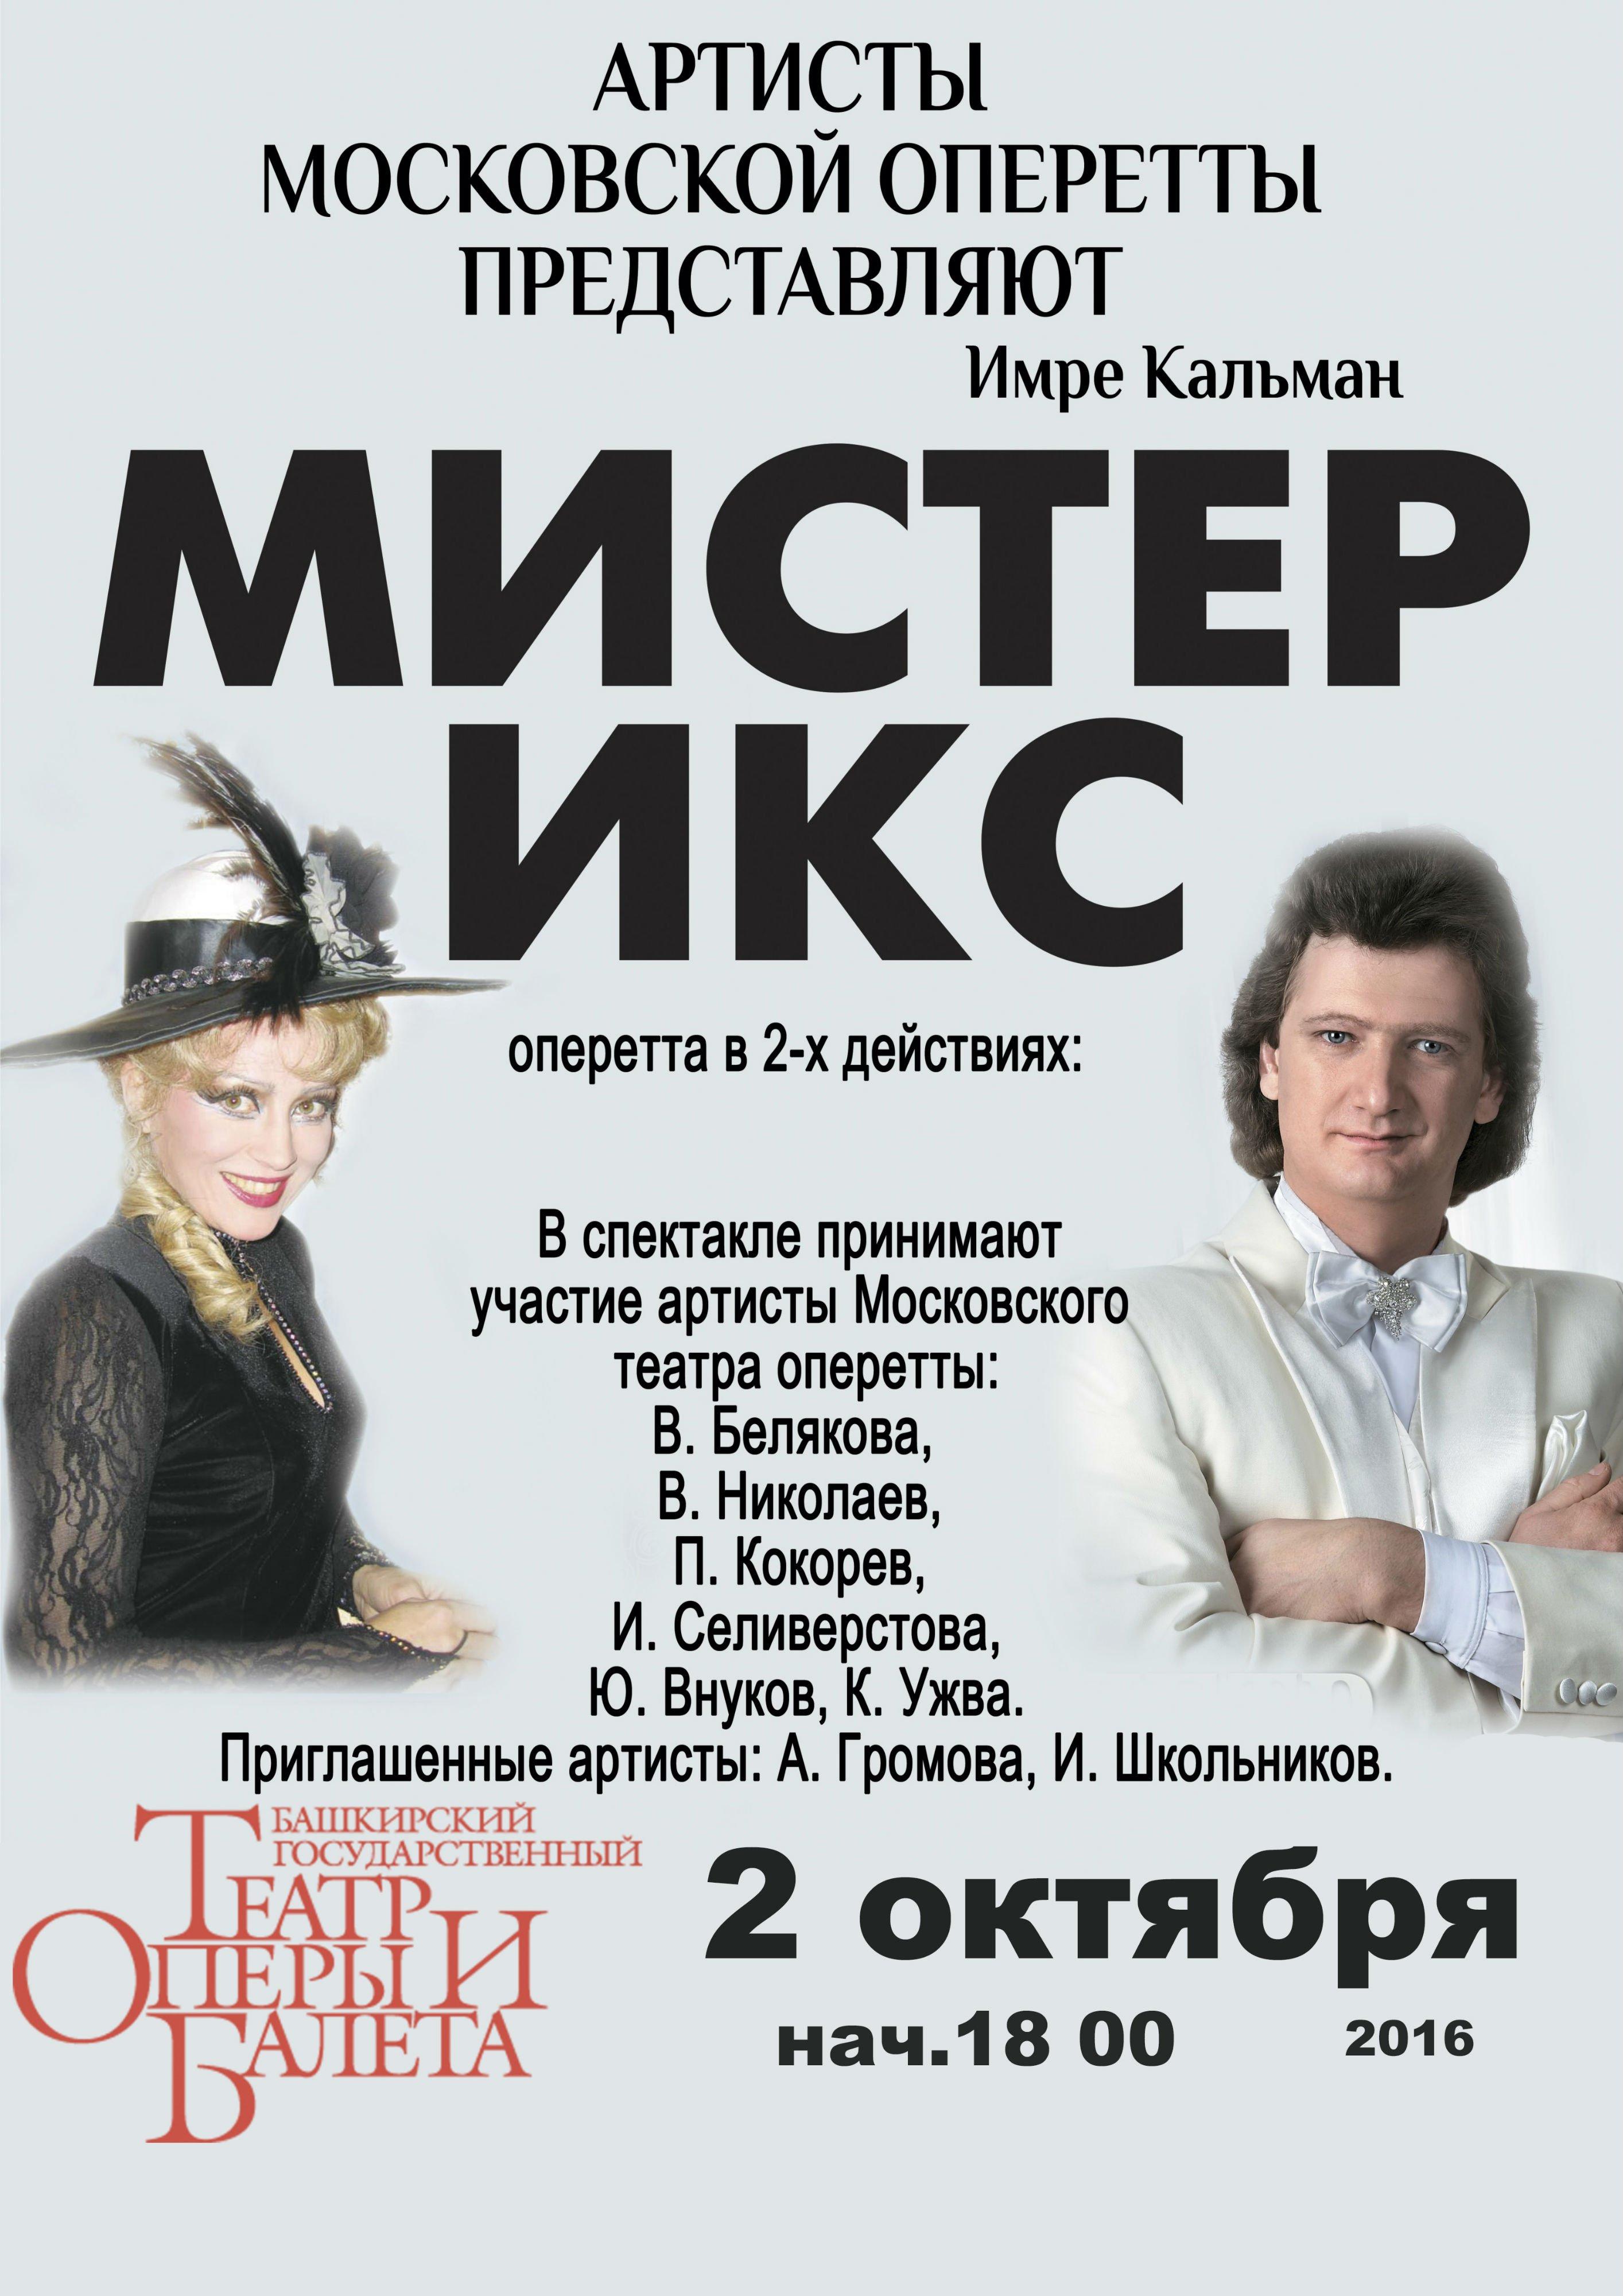 Оперетта «Мистер Икс». Звезды Московской оперетты